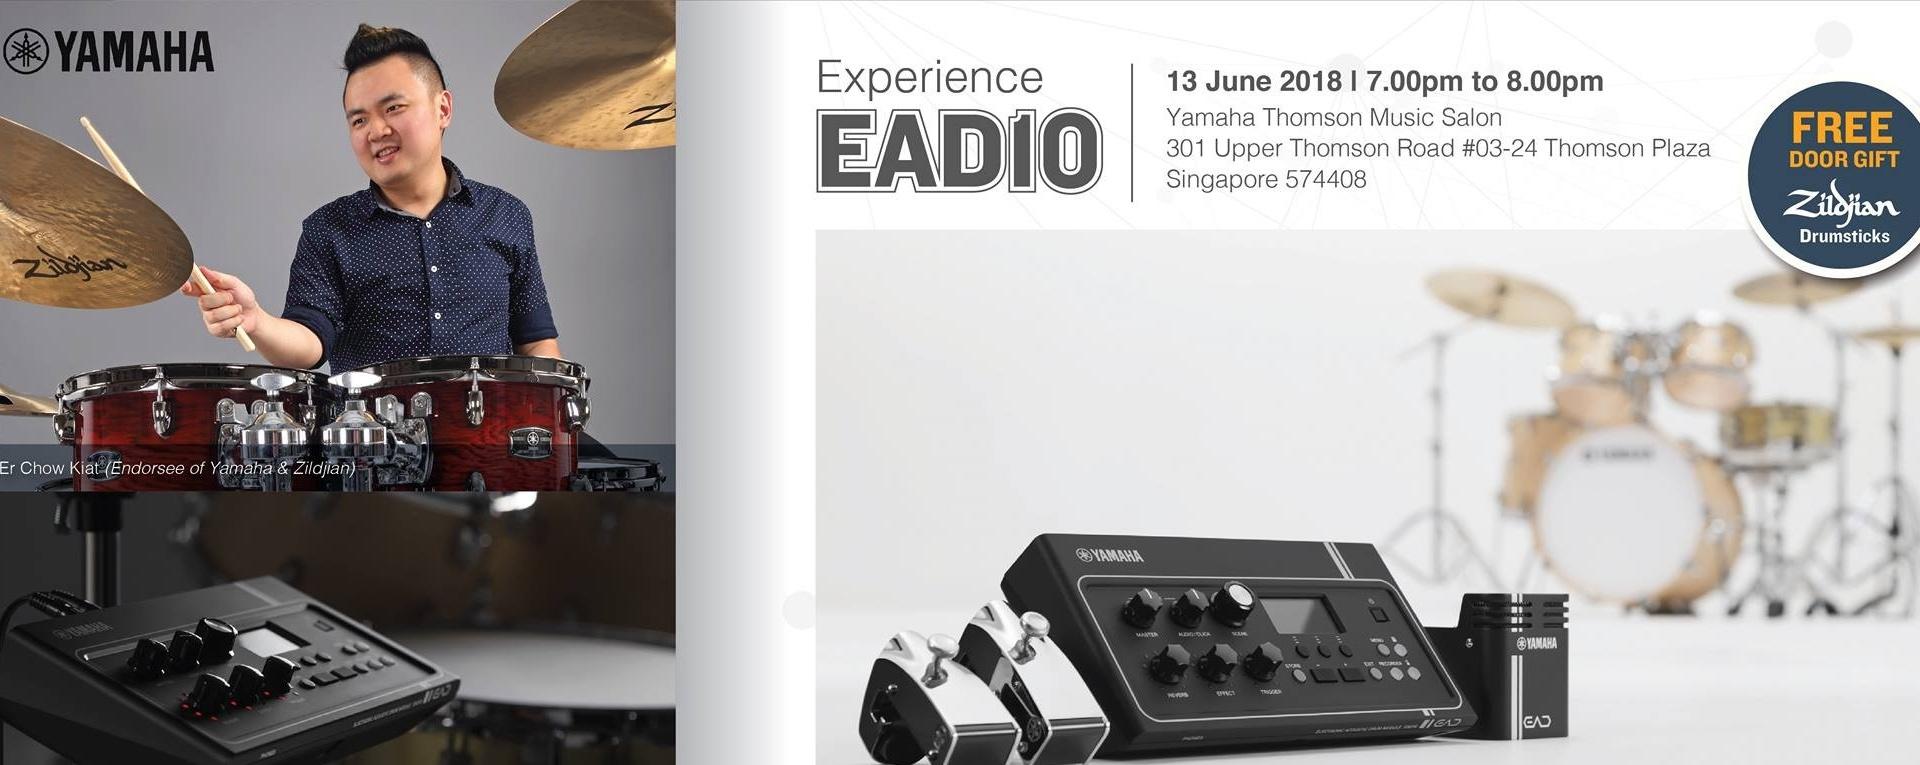 ExperienceEAD10